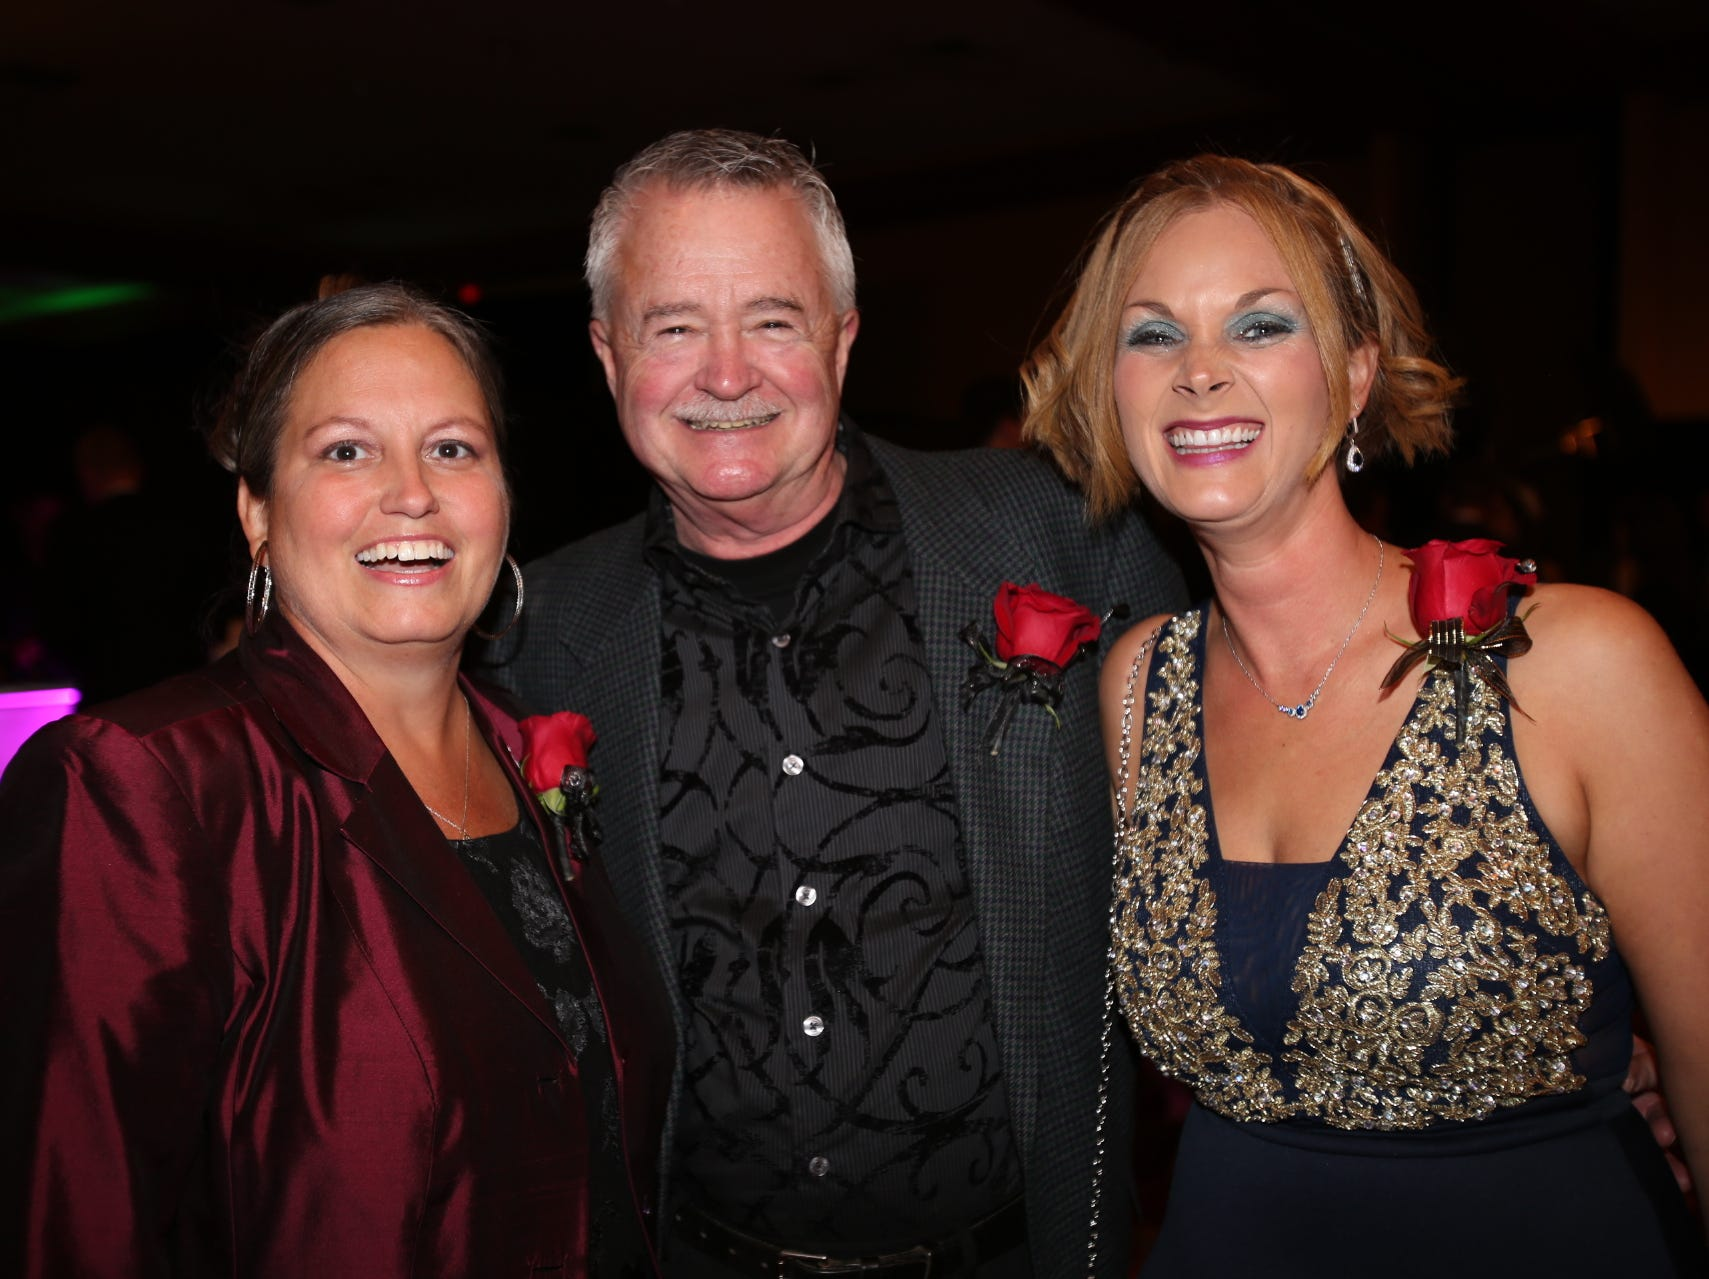 Kim Prescott, Steve Waddell, and Courtney Pinkham-Martin